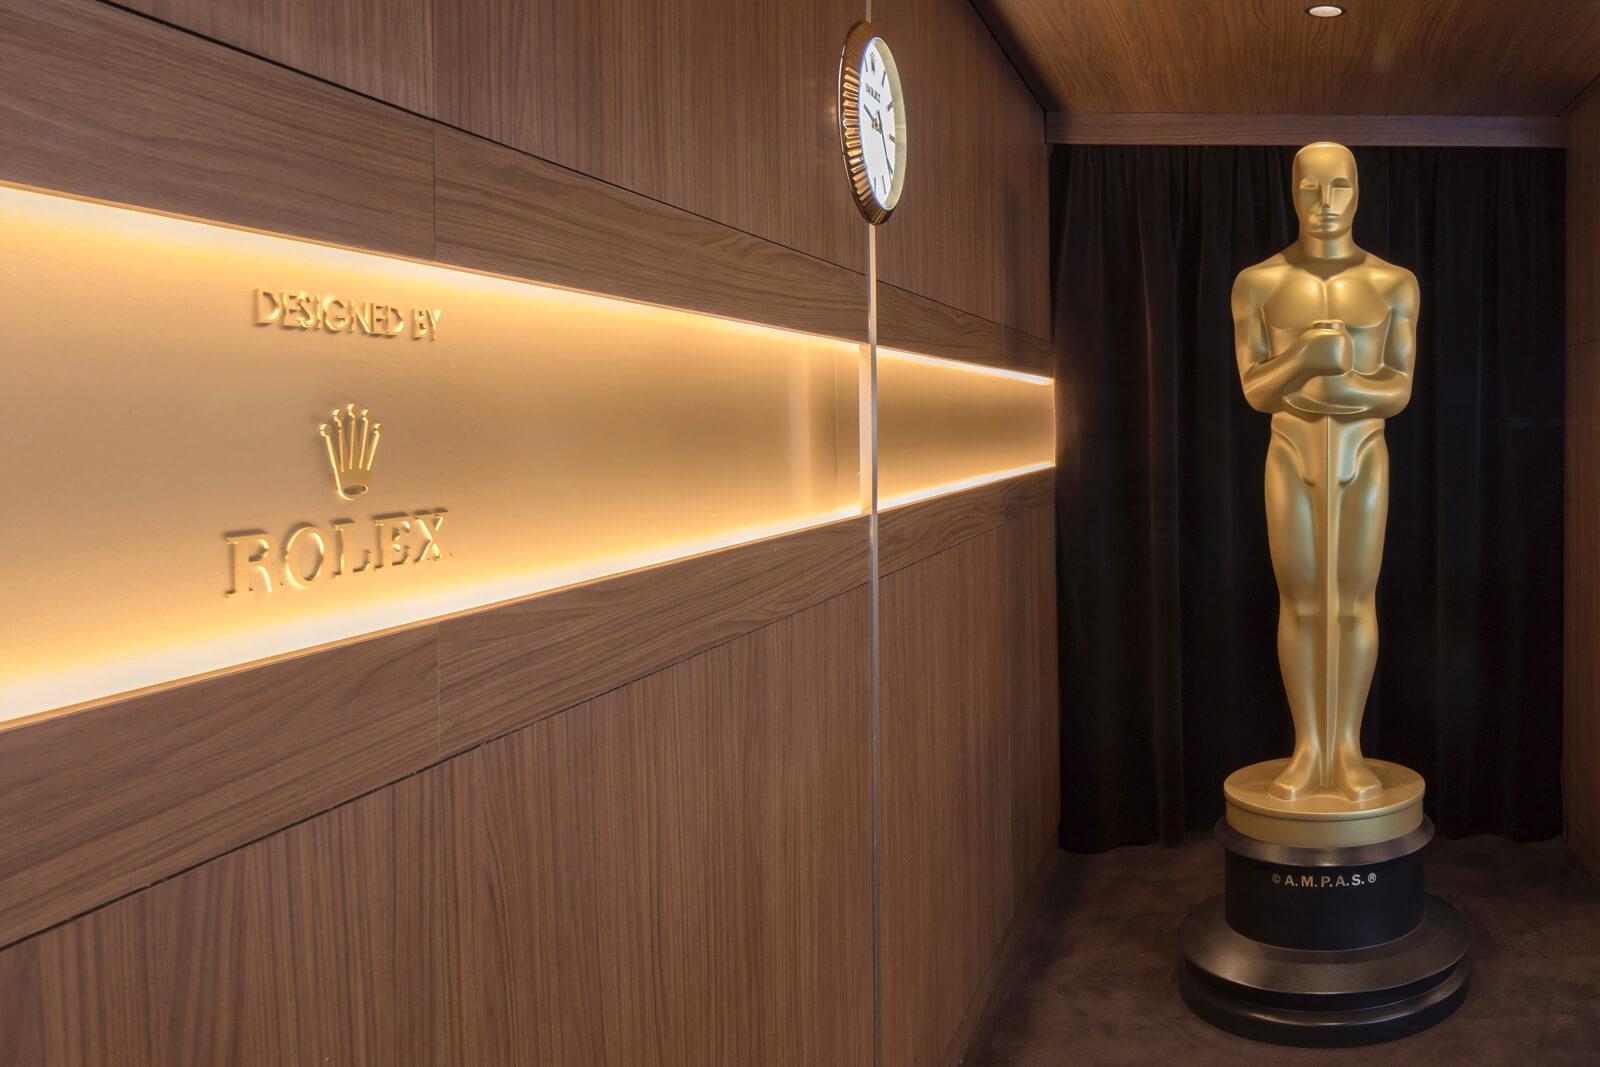 Rolex & Cinema - Proud partner of the Oscar